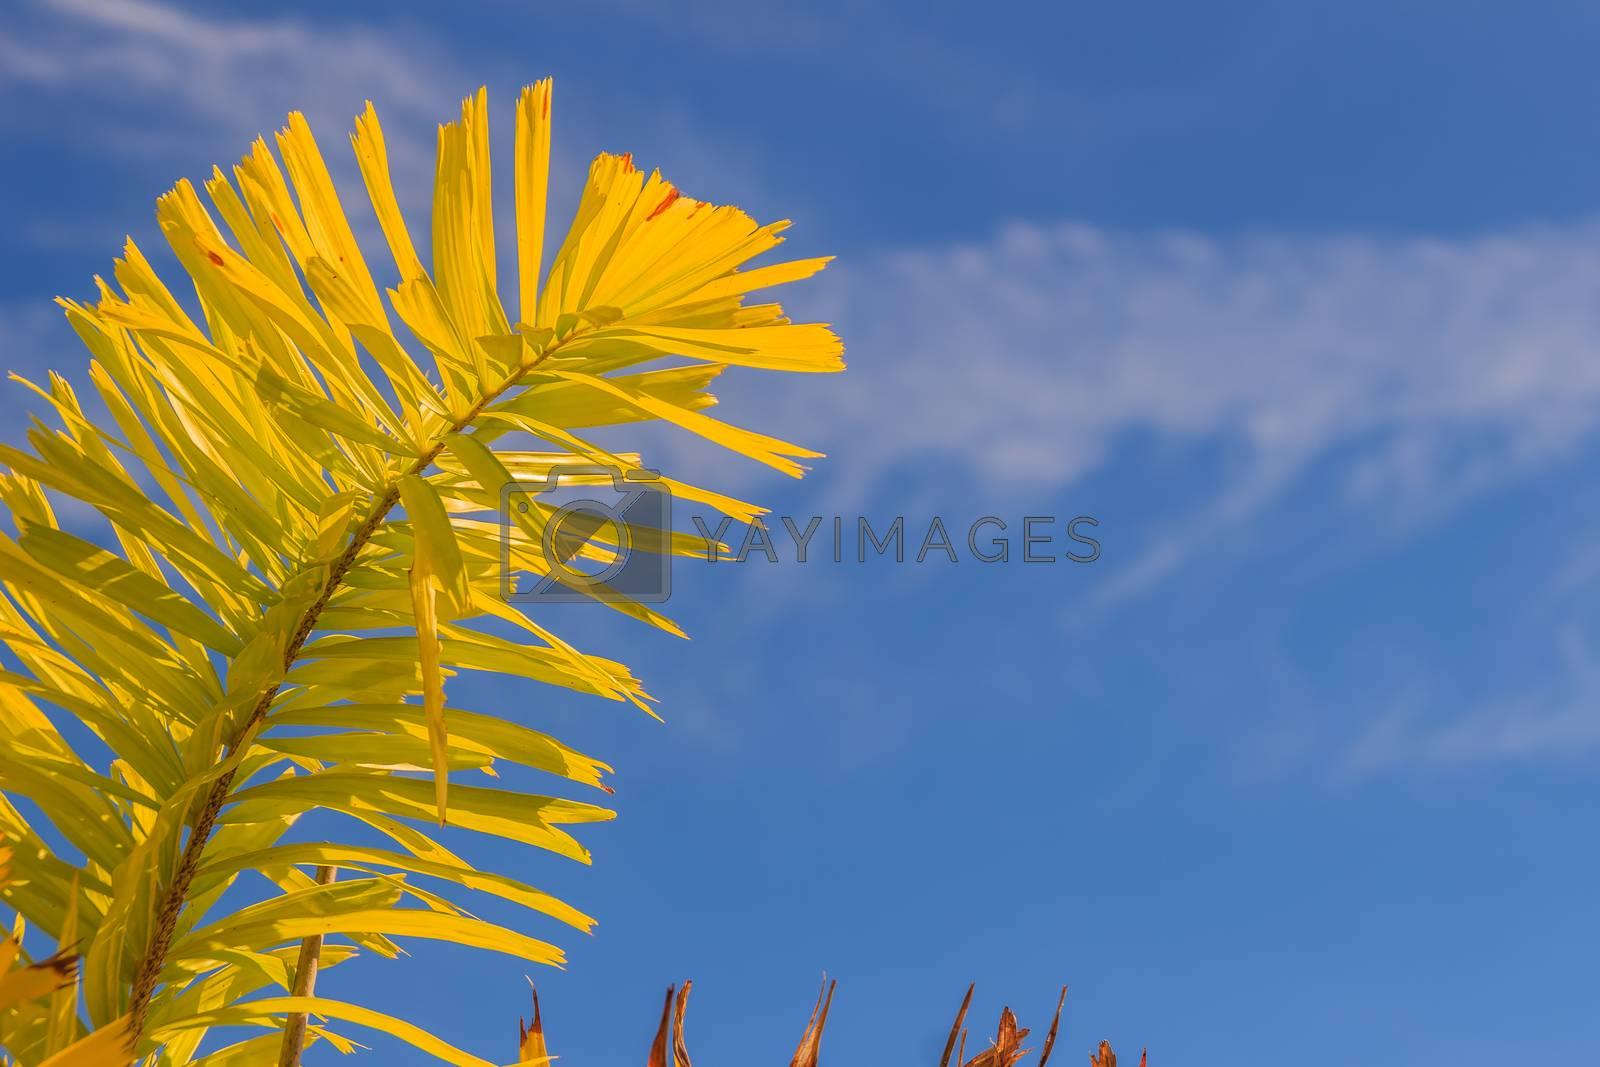 Foxtail palm (Wodyetia bifurcate A.K. Irvine) leaves under blue sky background.